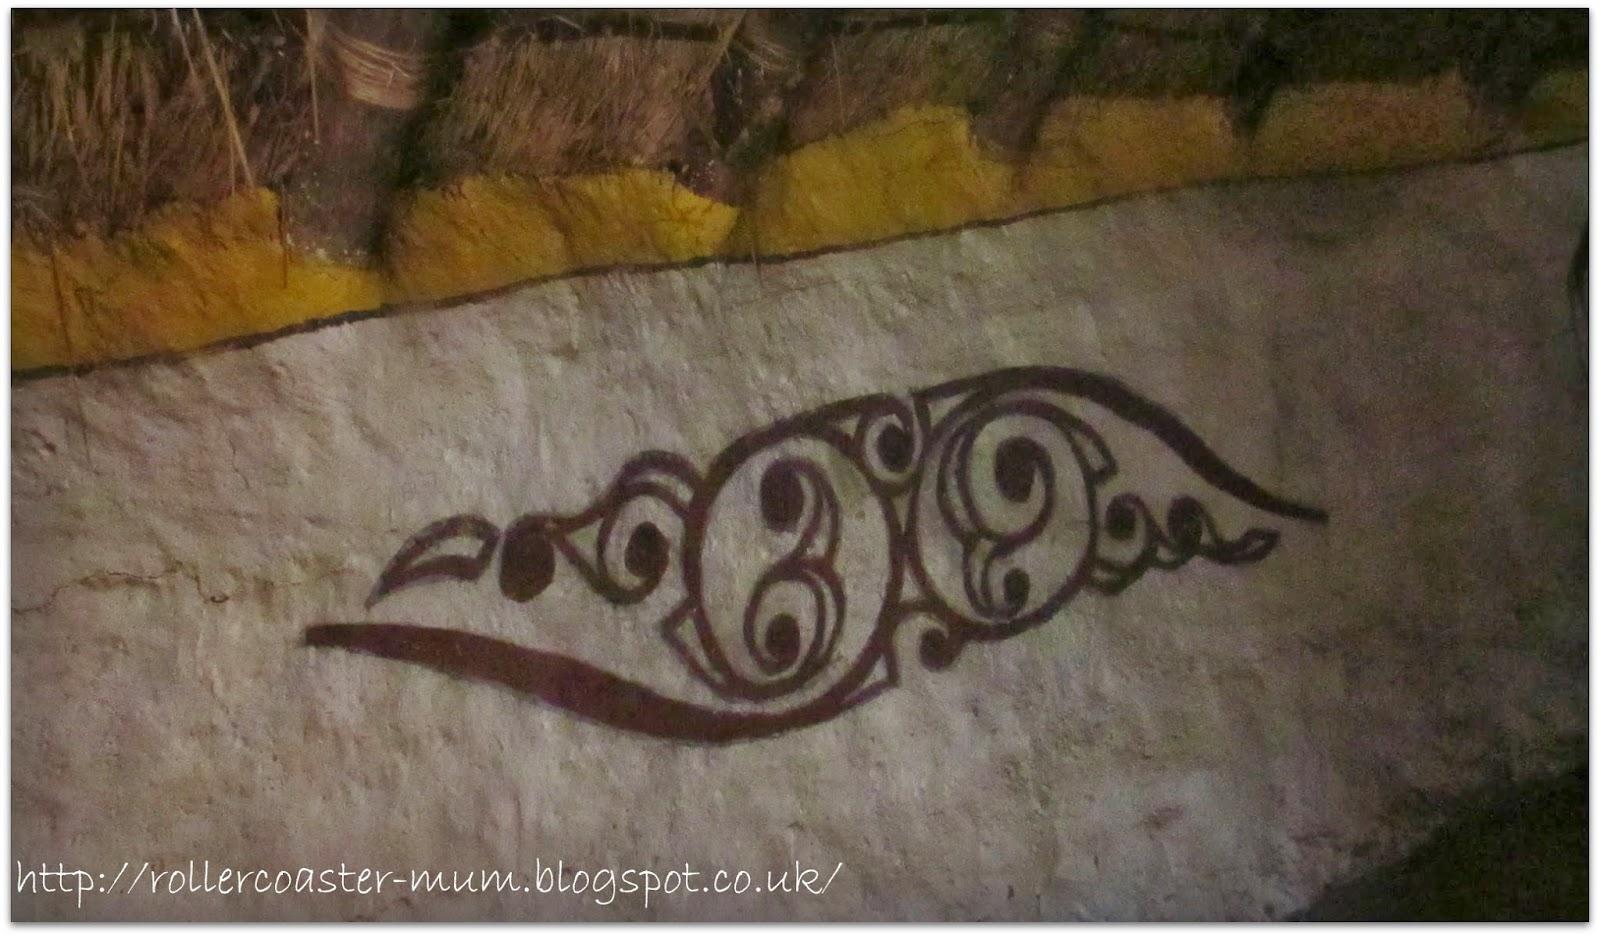 Celtic wall art - roundhouse - Butser Ancient Farm